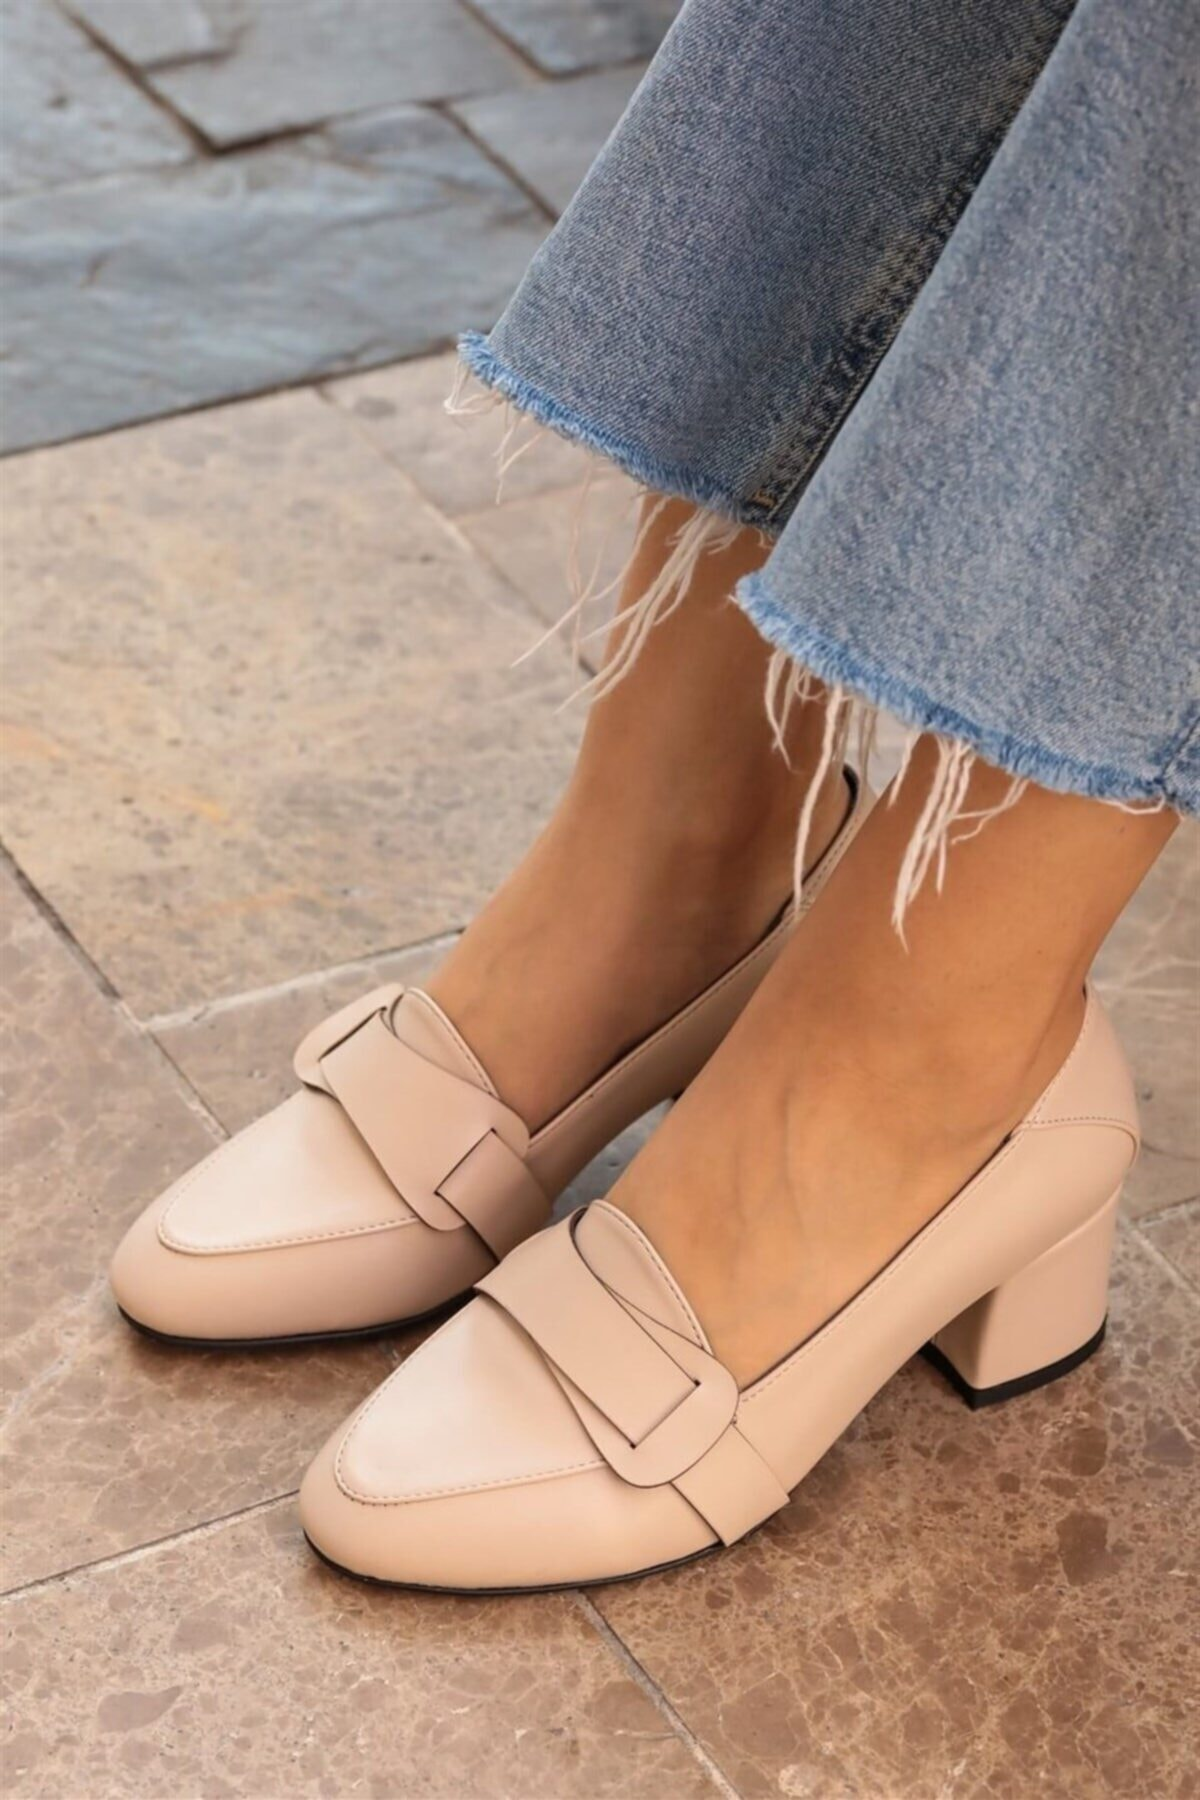 Mio Gusto Romy Krem Renk Topuklu Ayakkabı 1